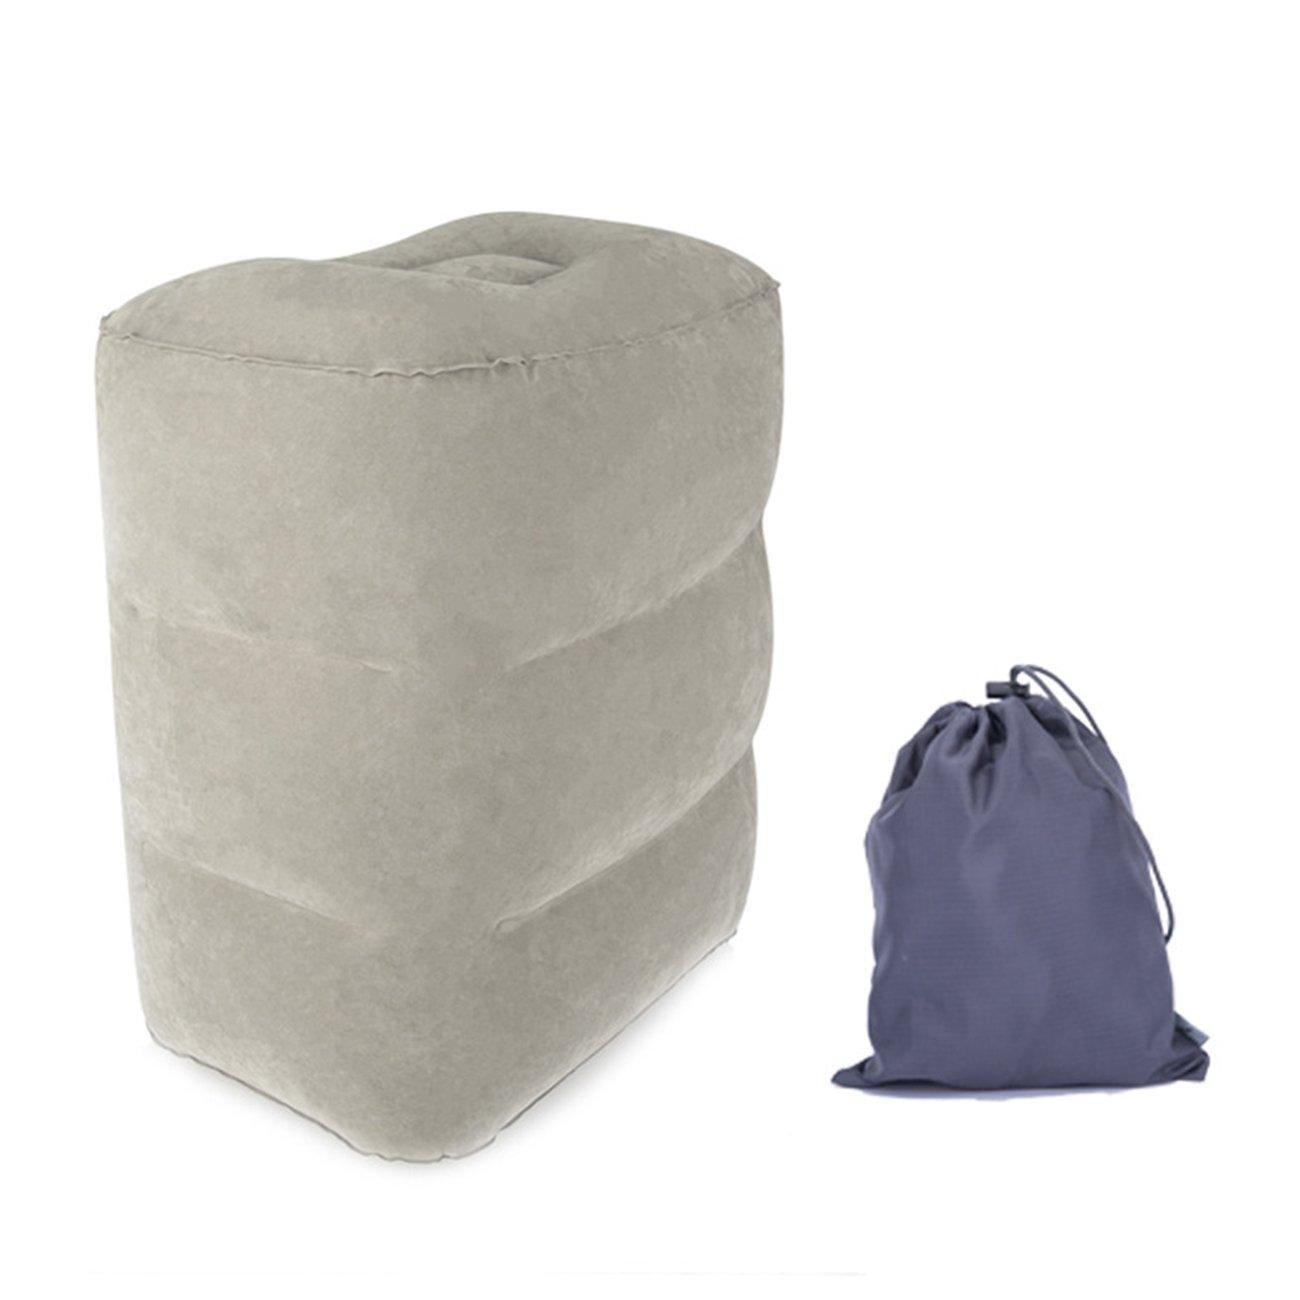 Theeインフレータブル足残り枕キャンプAir Travel Pillow for Resting足脚 2 layer SJJJDZ521-2 B0757FGRYW 2 layer  2 layer